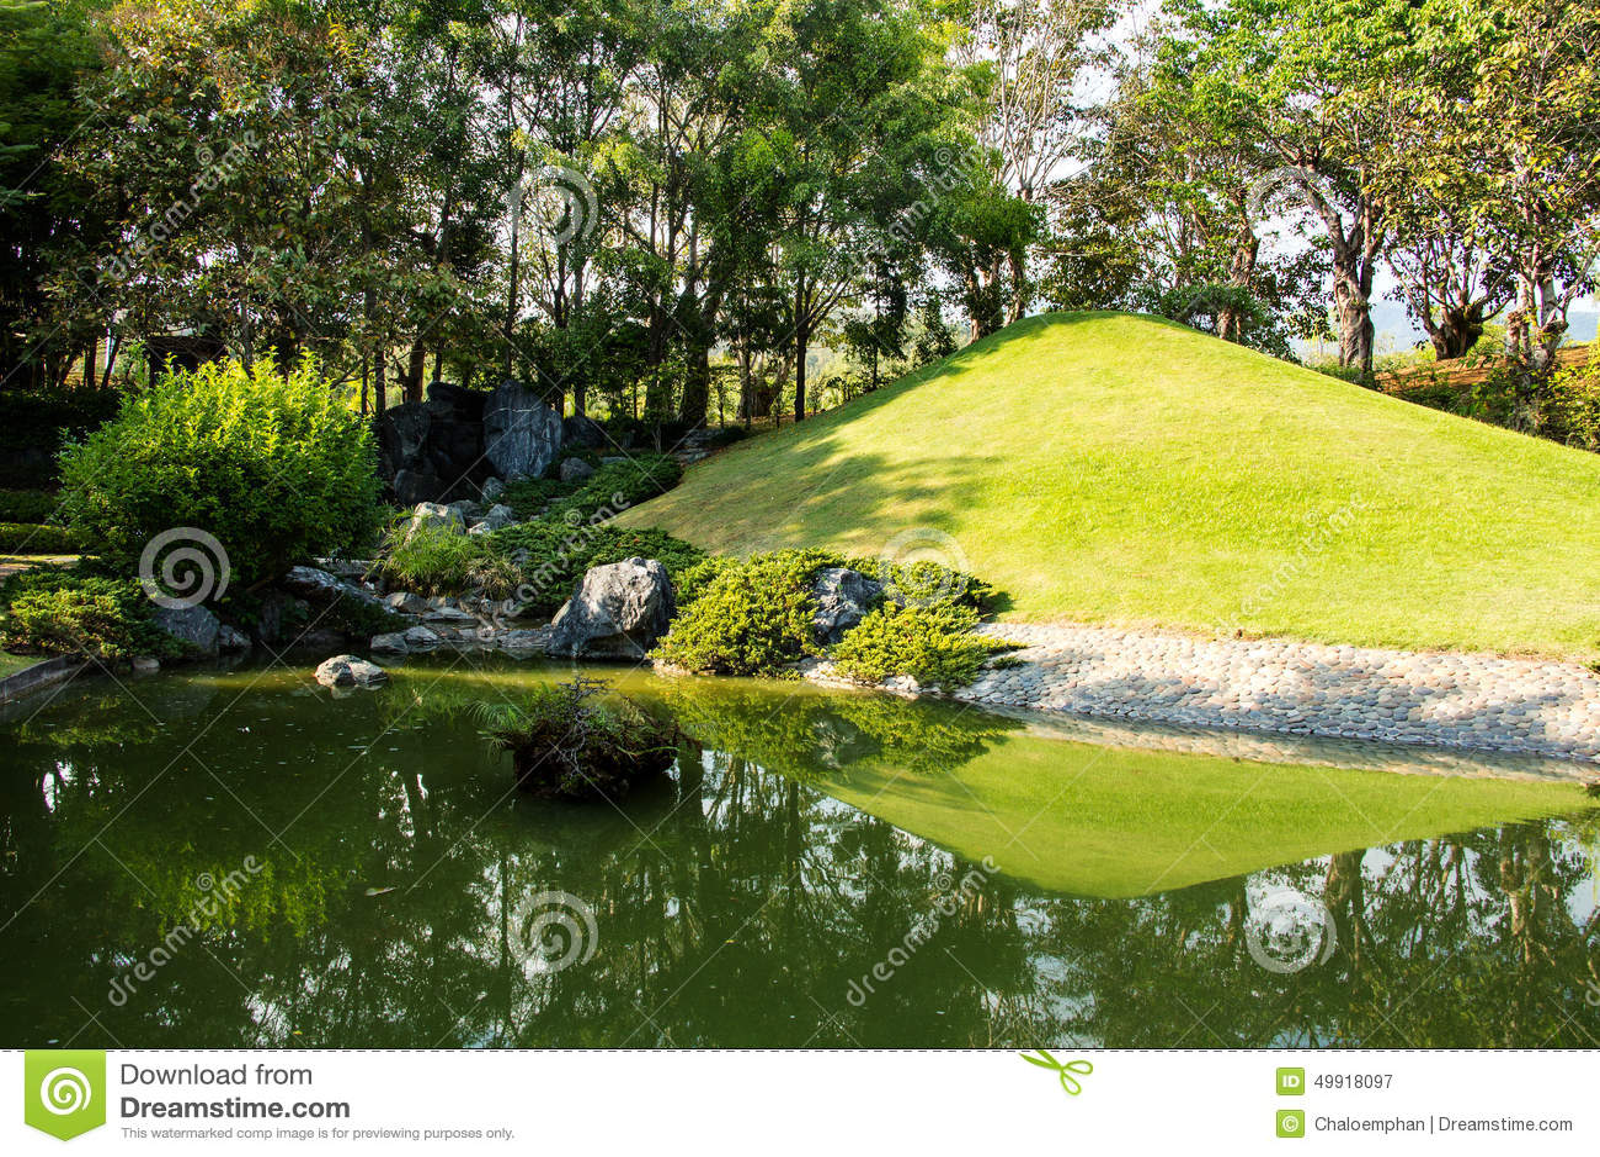 Garden design stock photo image 49918097 for Free japanese garden designs